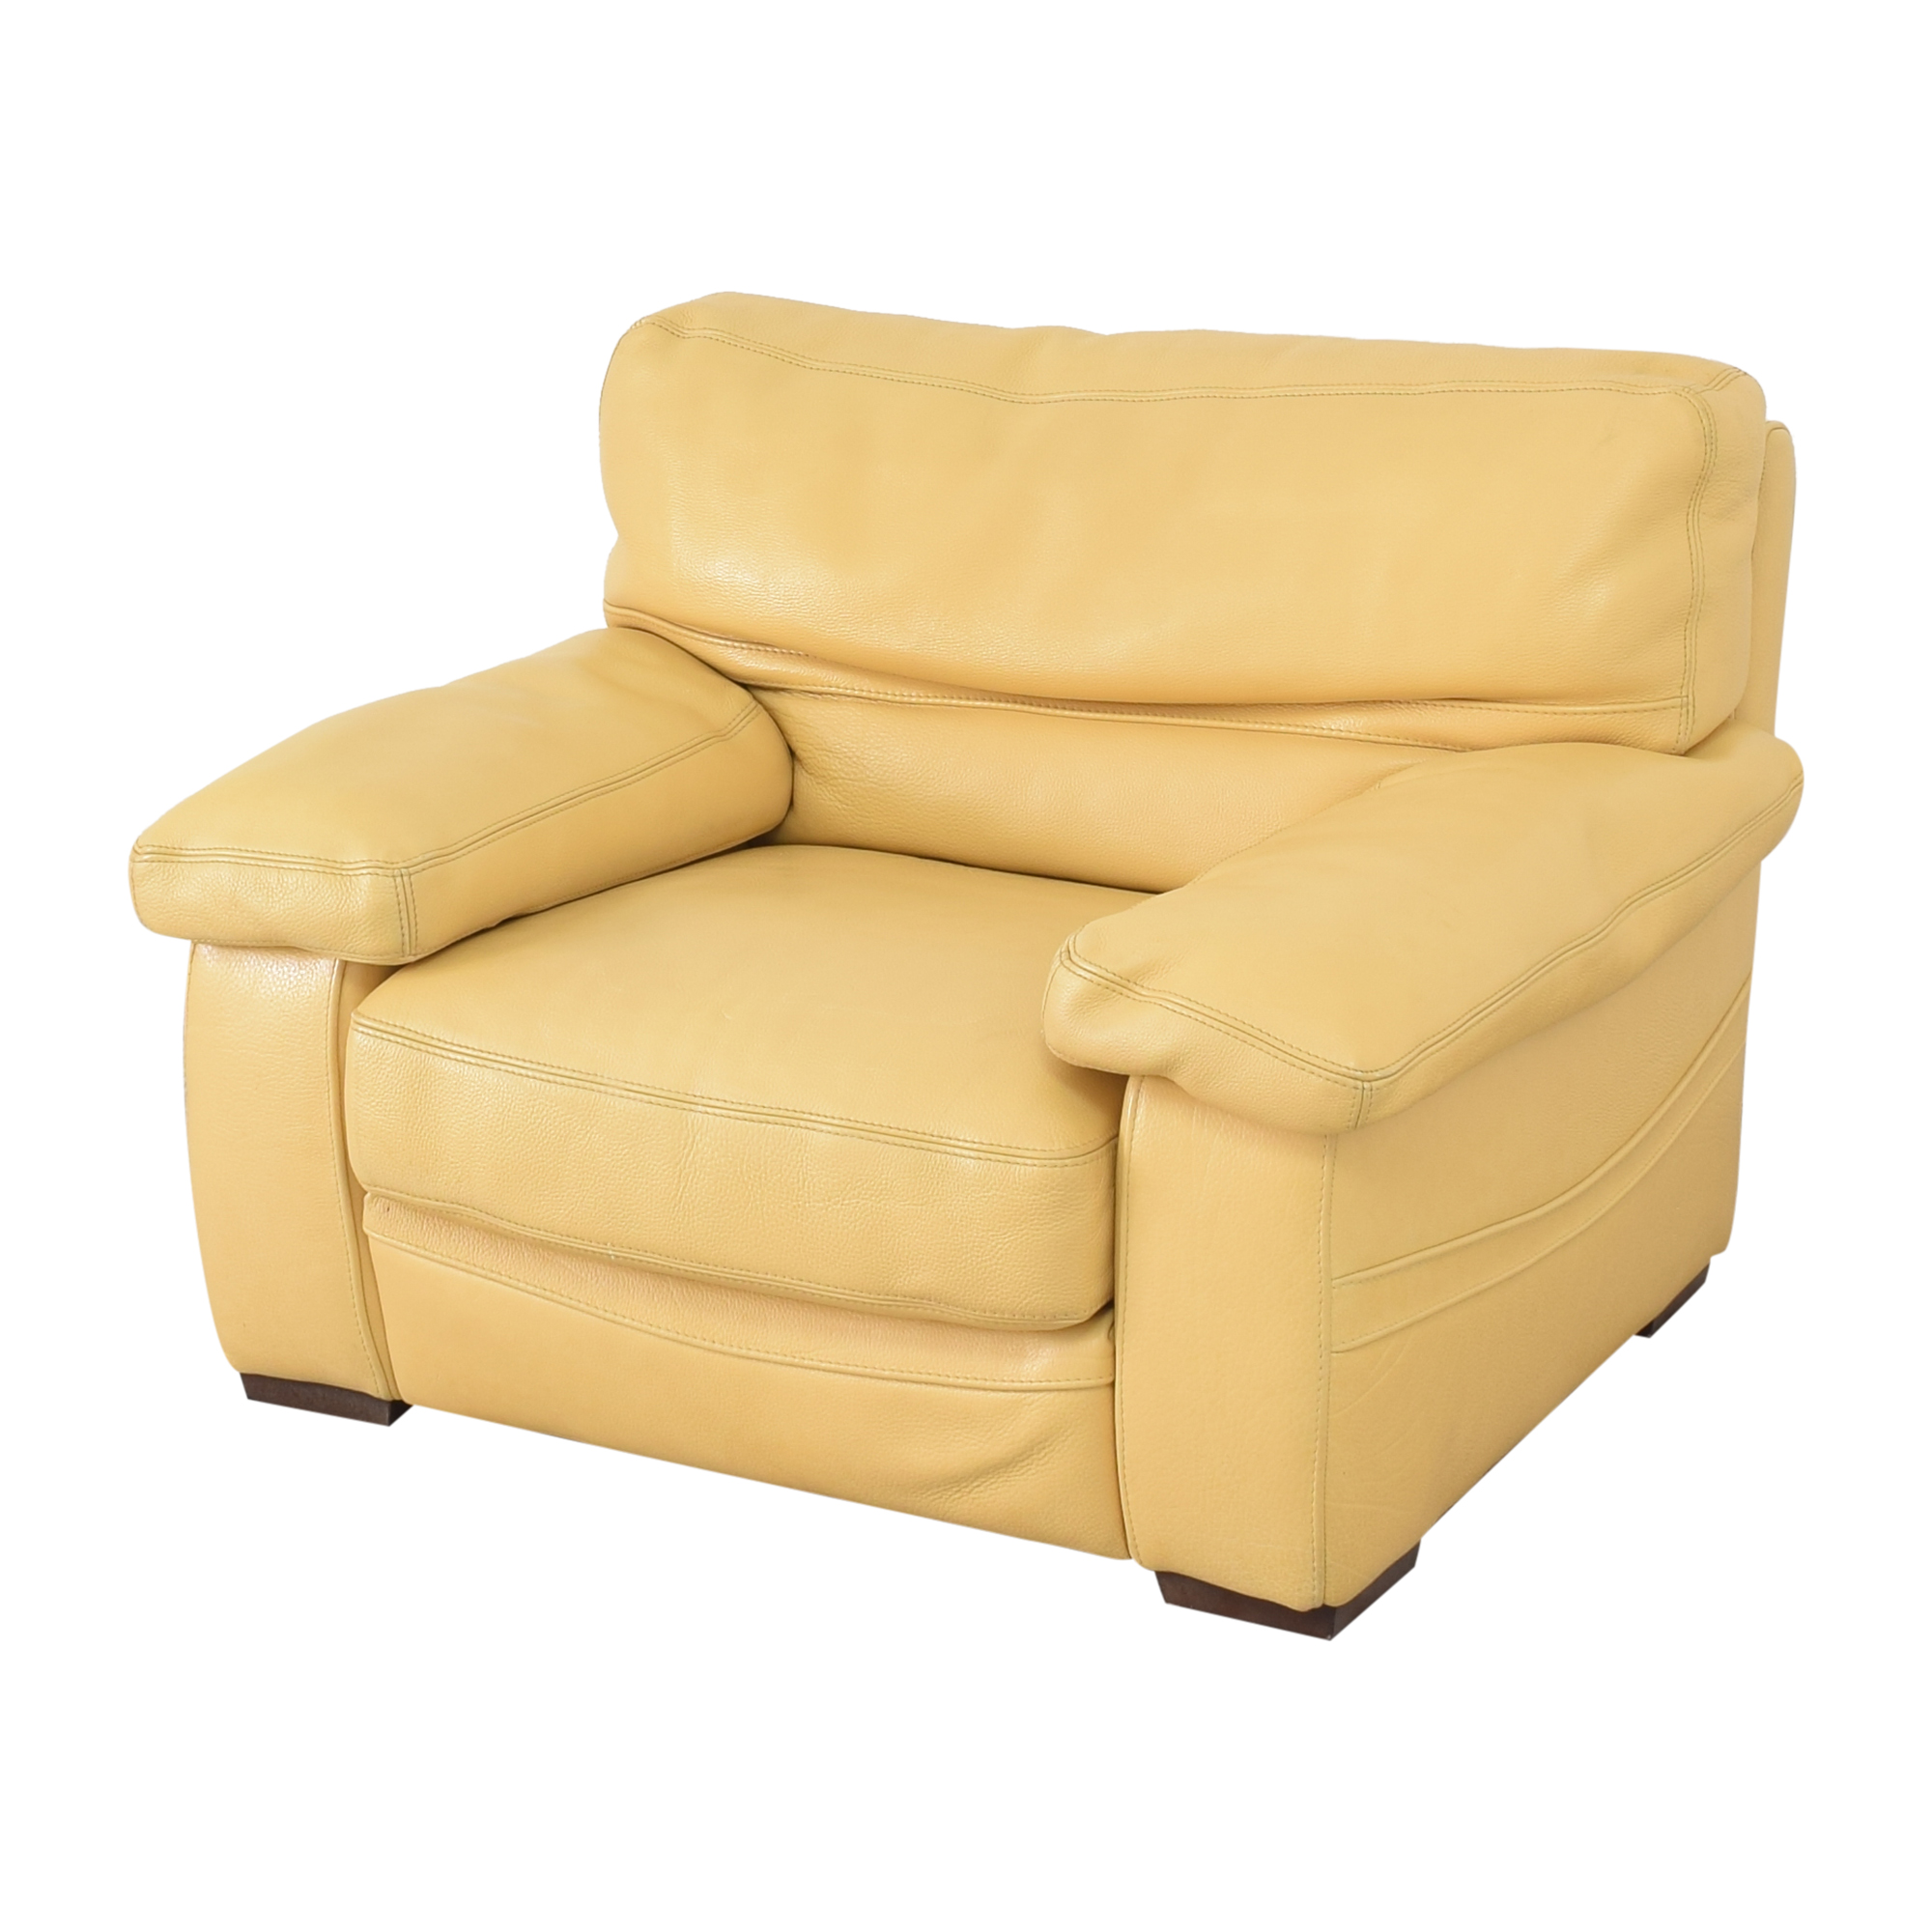 Roche Bobois Roche Bobois Accent Armchair with Ottoman price